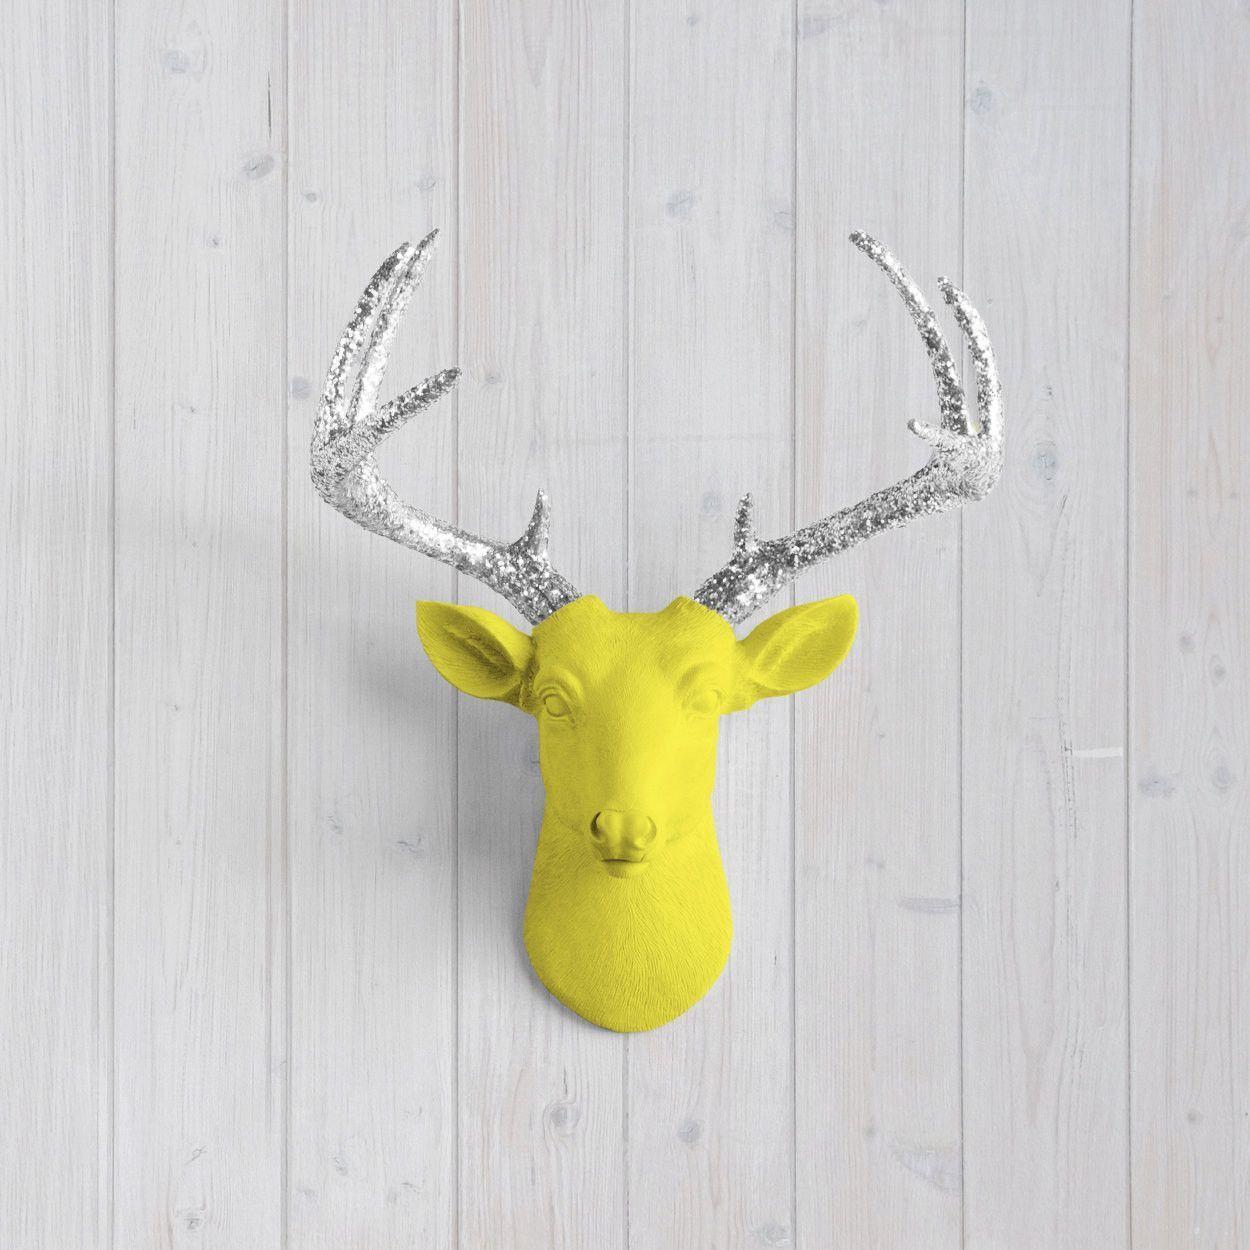 The MINI Virginia Yellow Faux Taxidermy Resin Deer Head Wall Mount ...